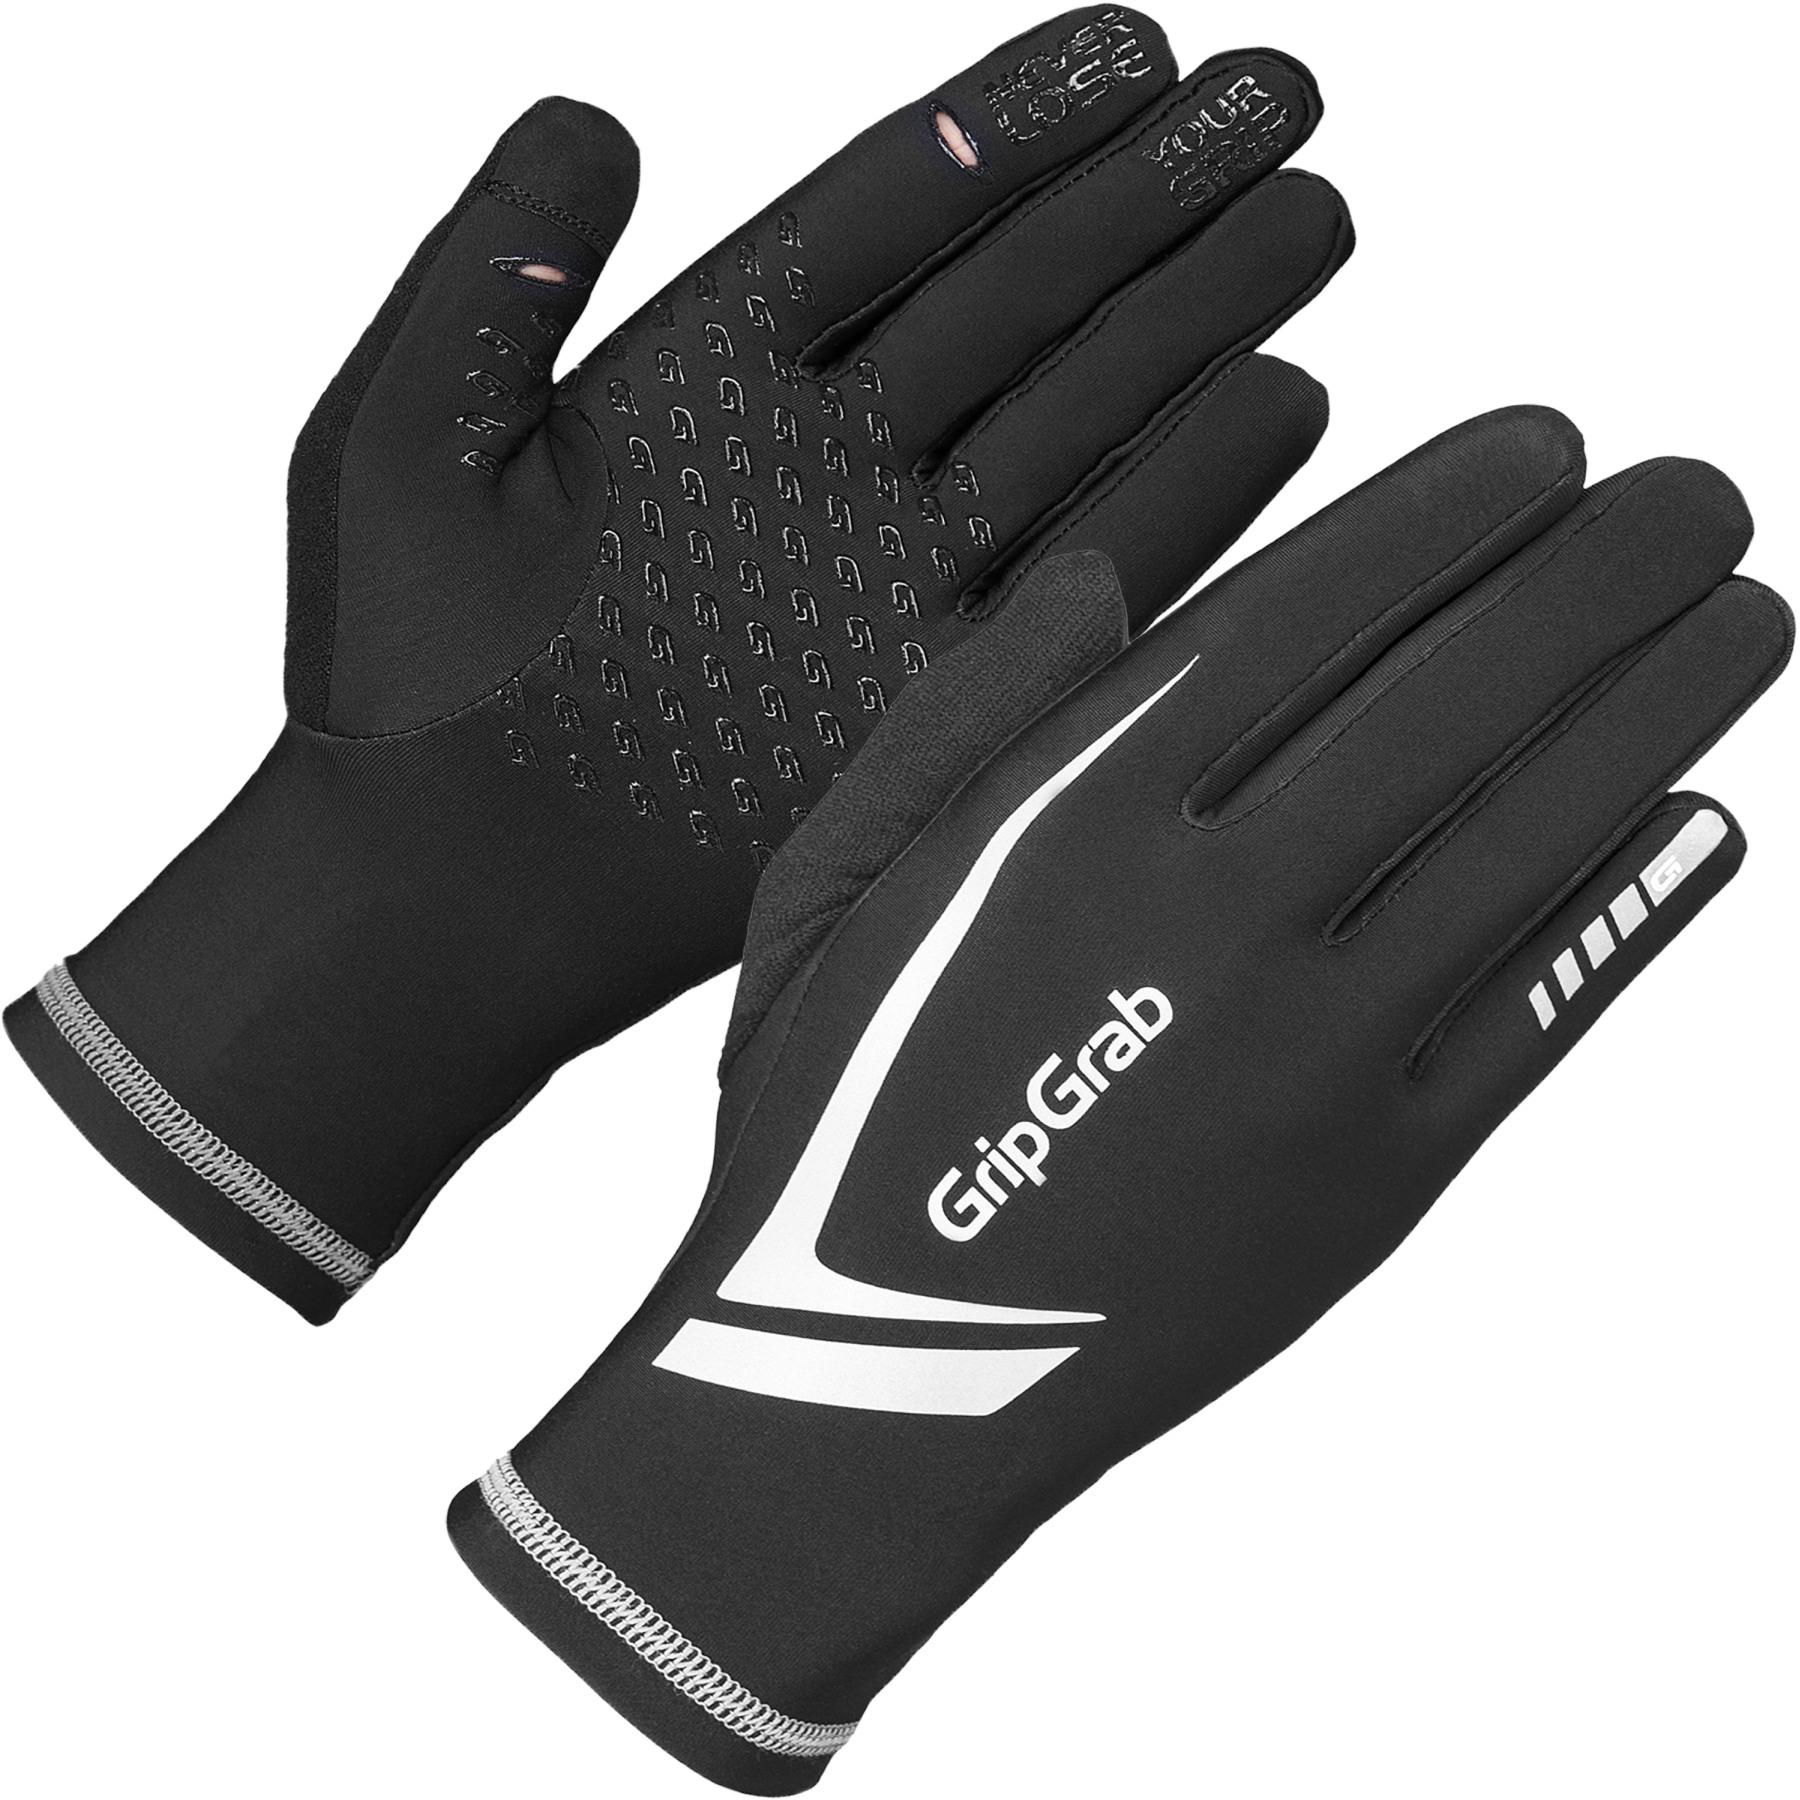 Produktbild von GripGrab Running Expert Winter Touchscreen Handschuh - black